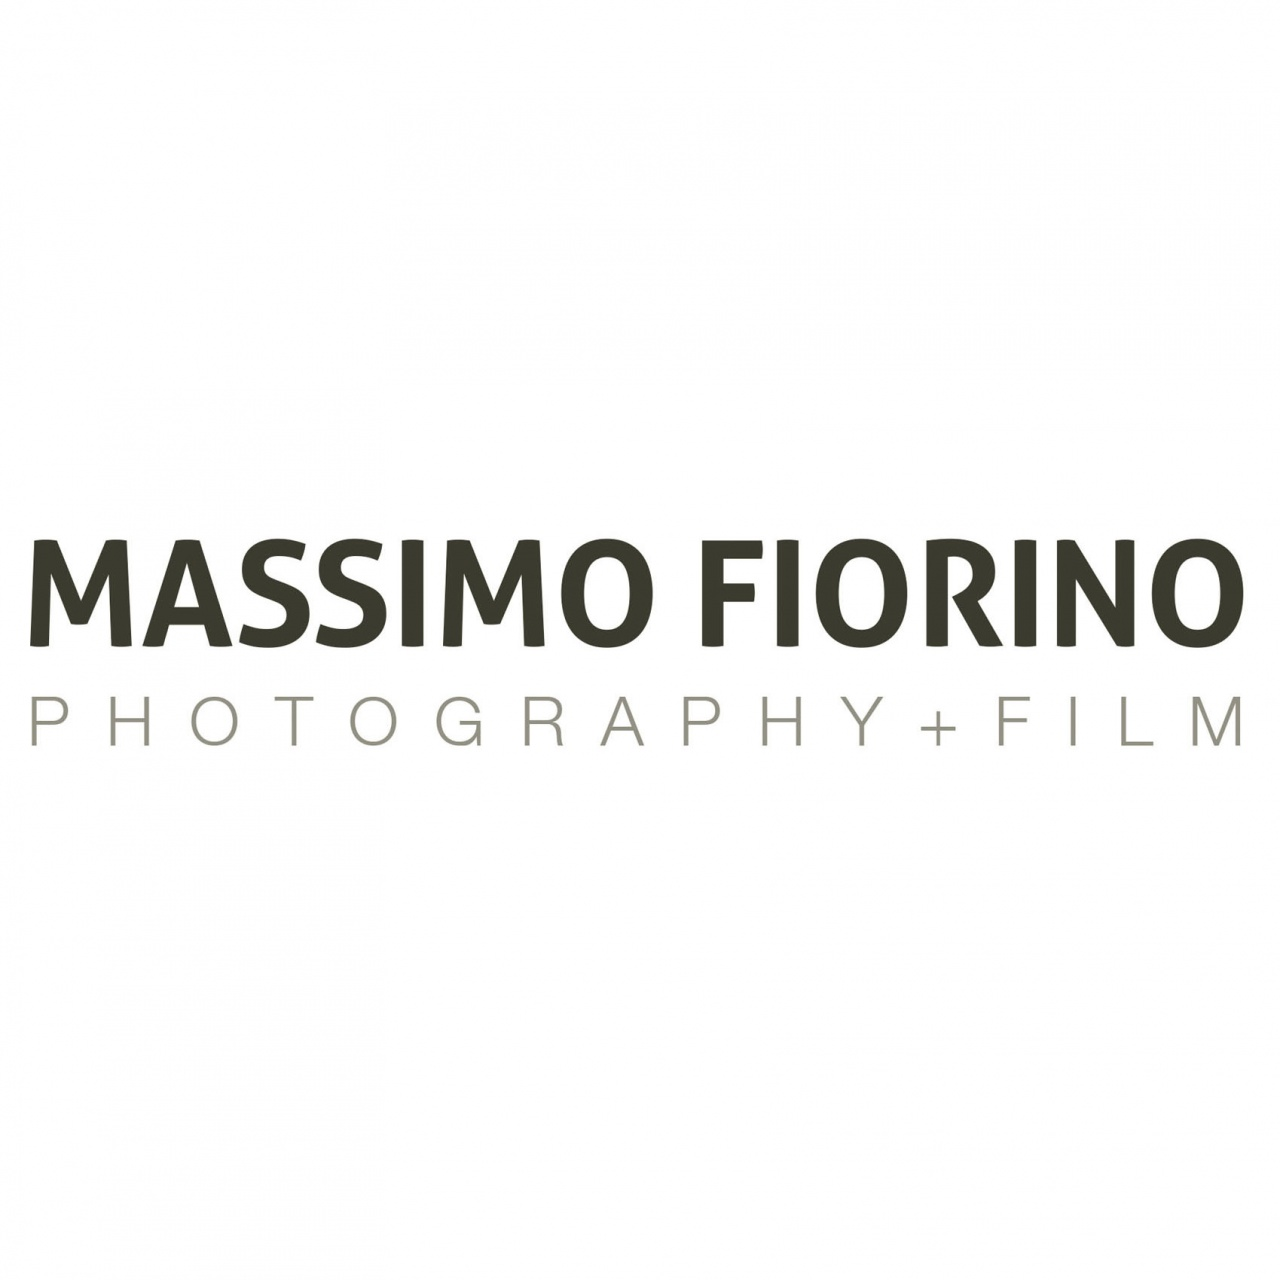 Massimo Fiorino Photo + Film Portfolio